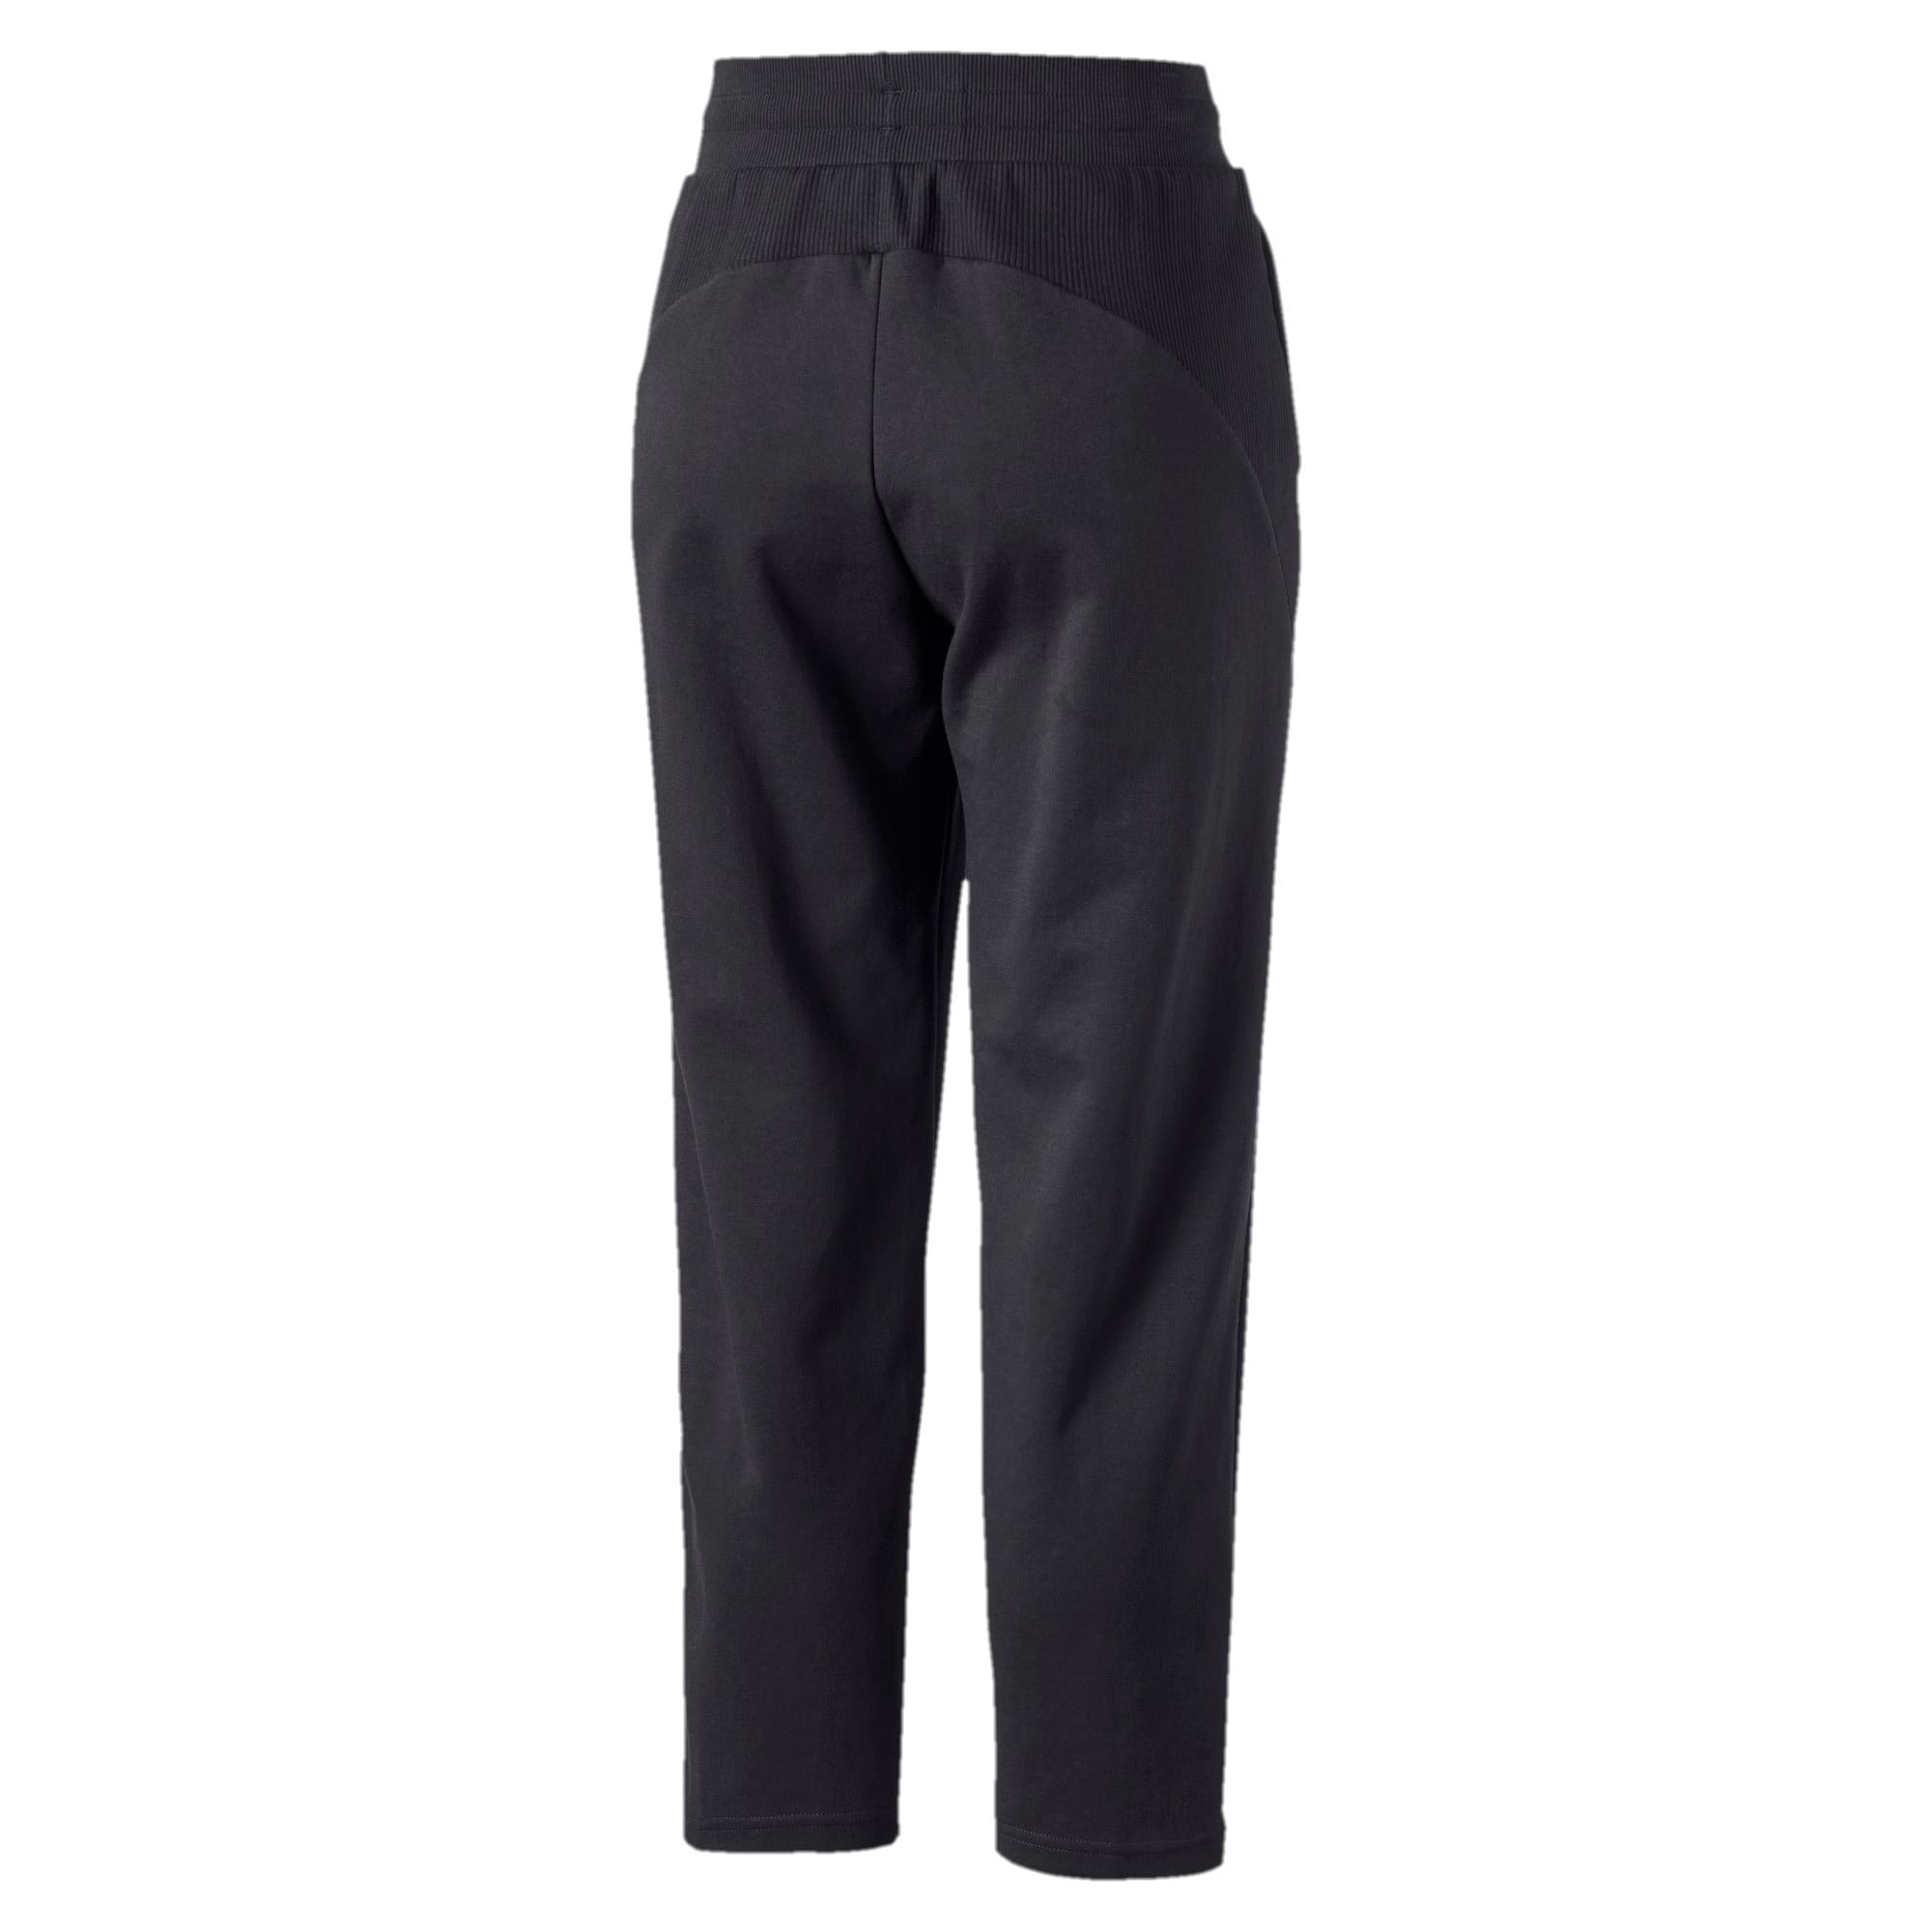 Thumbnail 5 of Fusion Pants, Cotton Black, medium